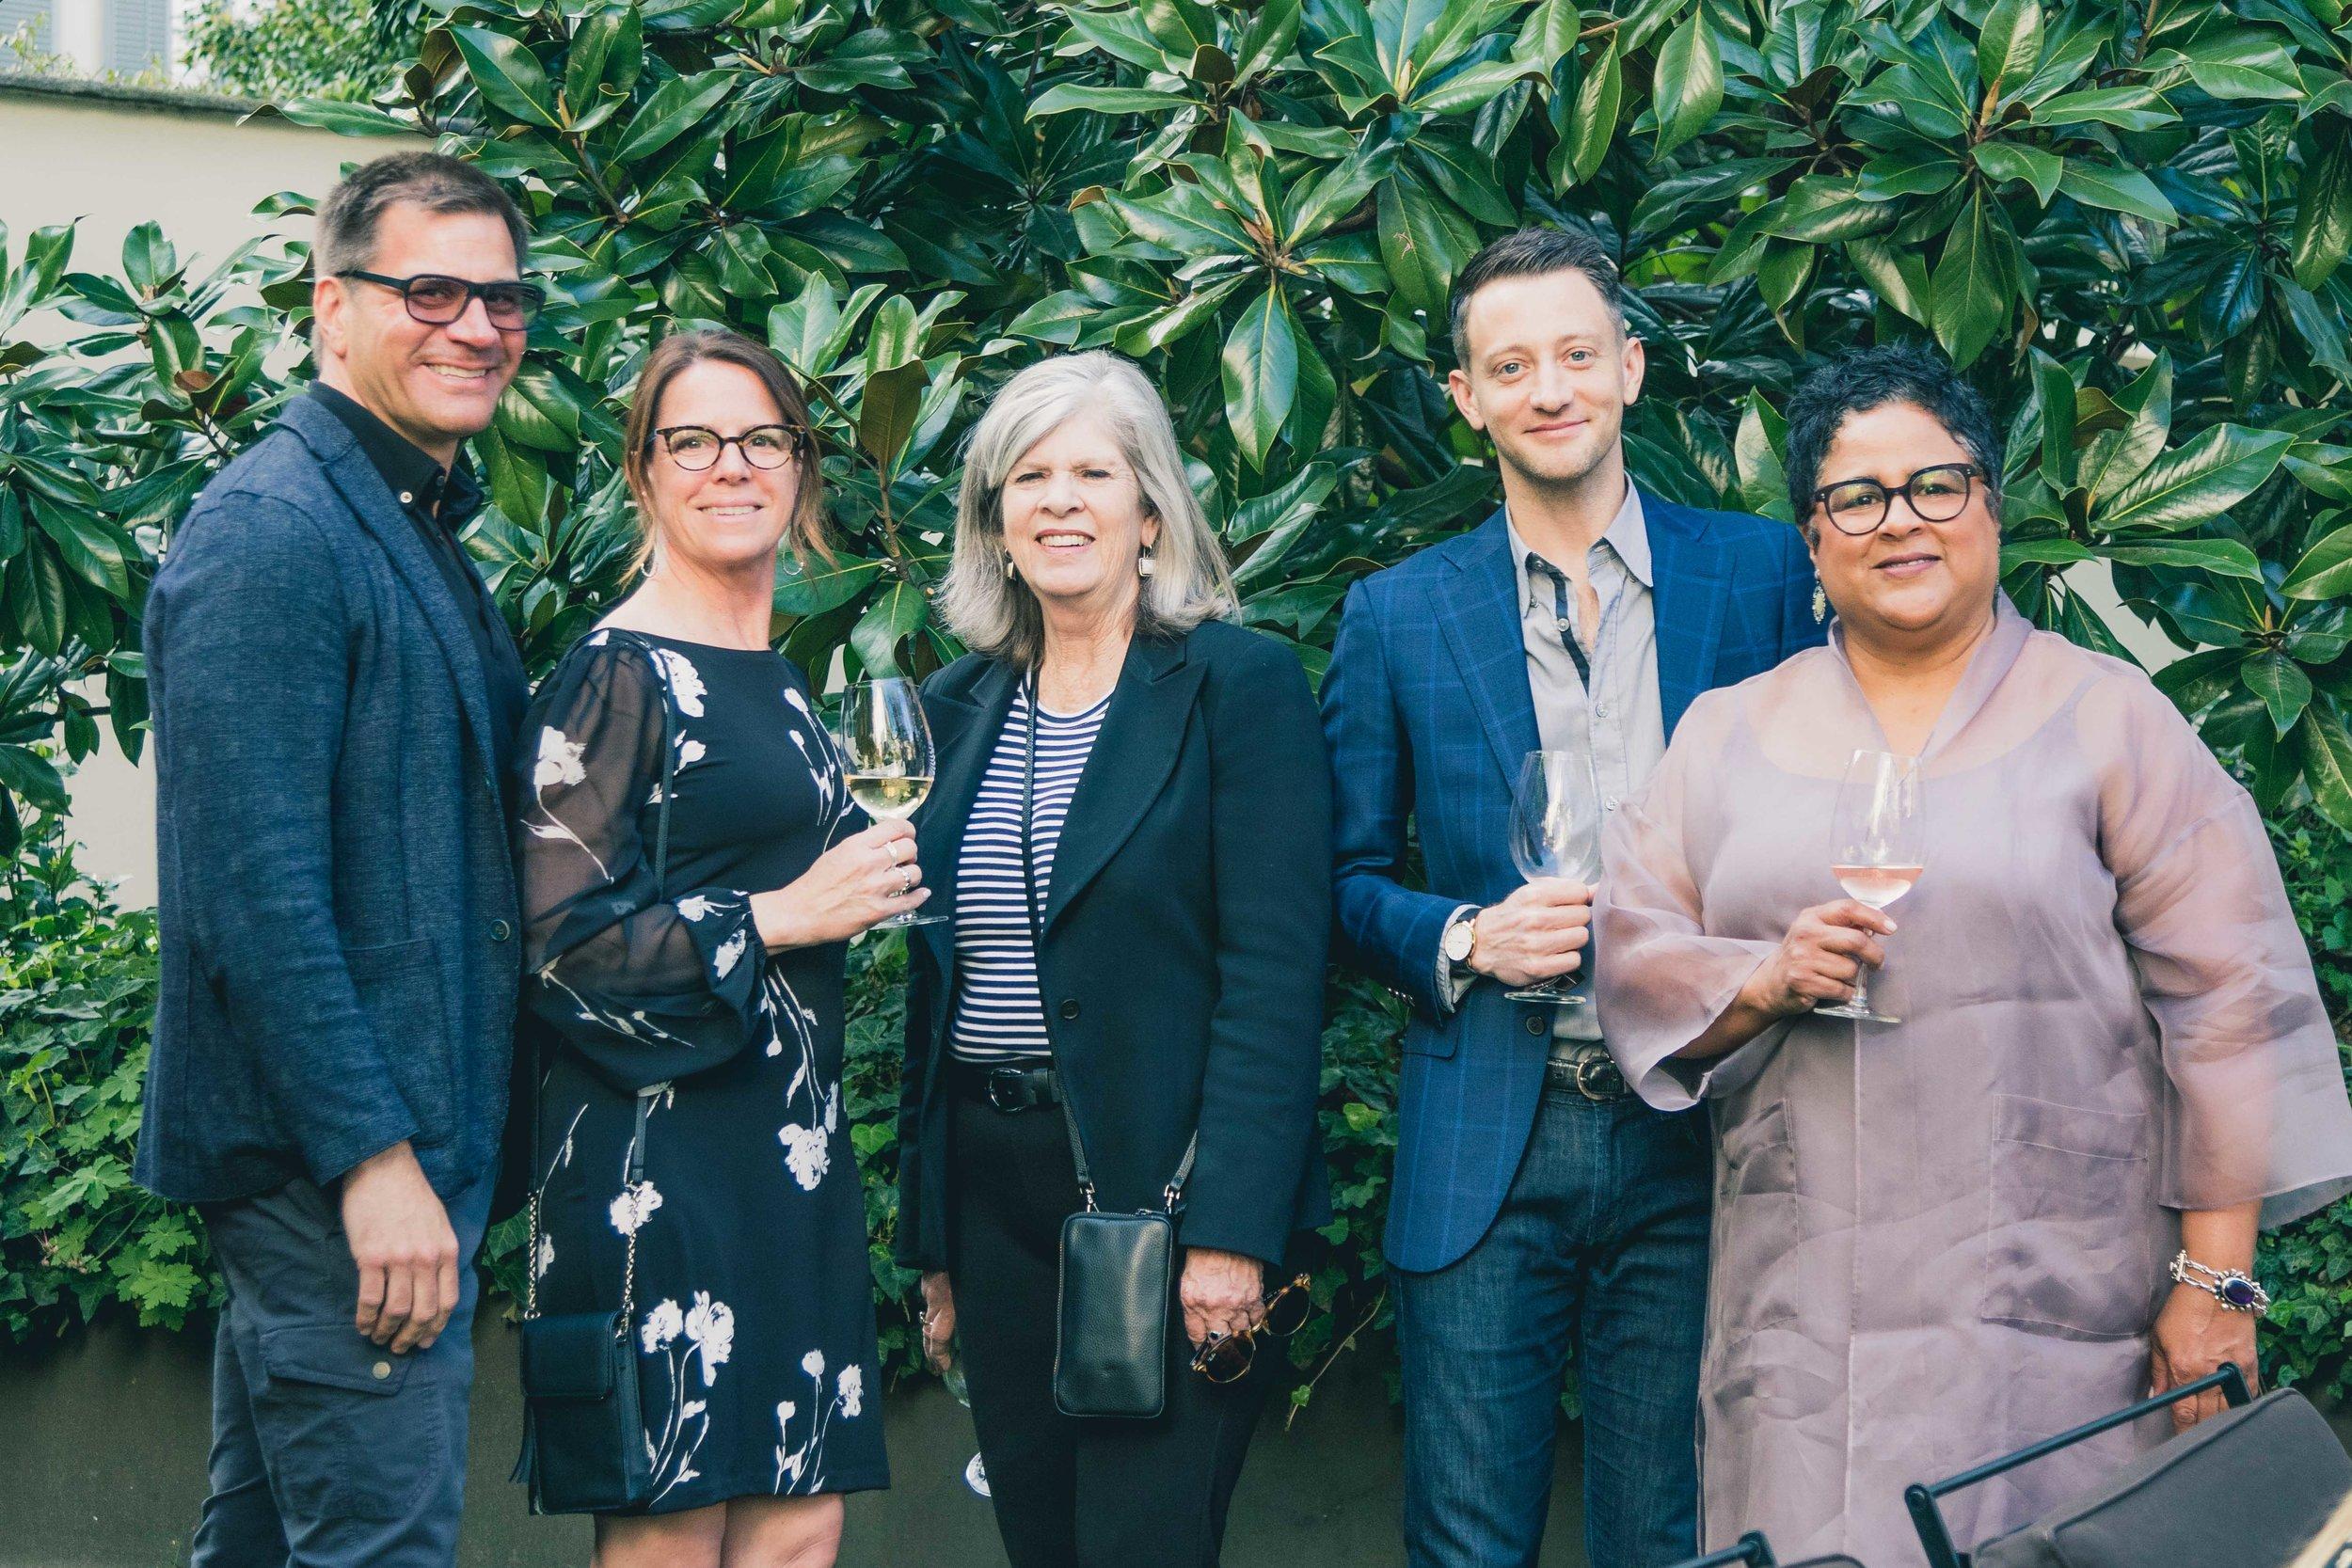 Stephan Jones of Stephan Jones Interiors, Mariann Claggett of Kitchen Design Group, Barbara Lowenthal, Caren Rideau of Kitchen Design Group